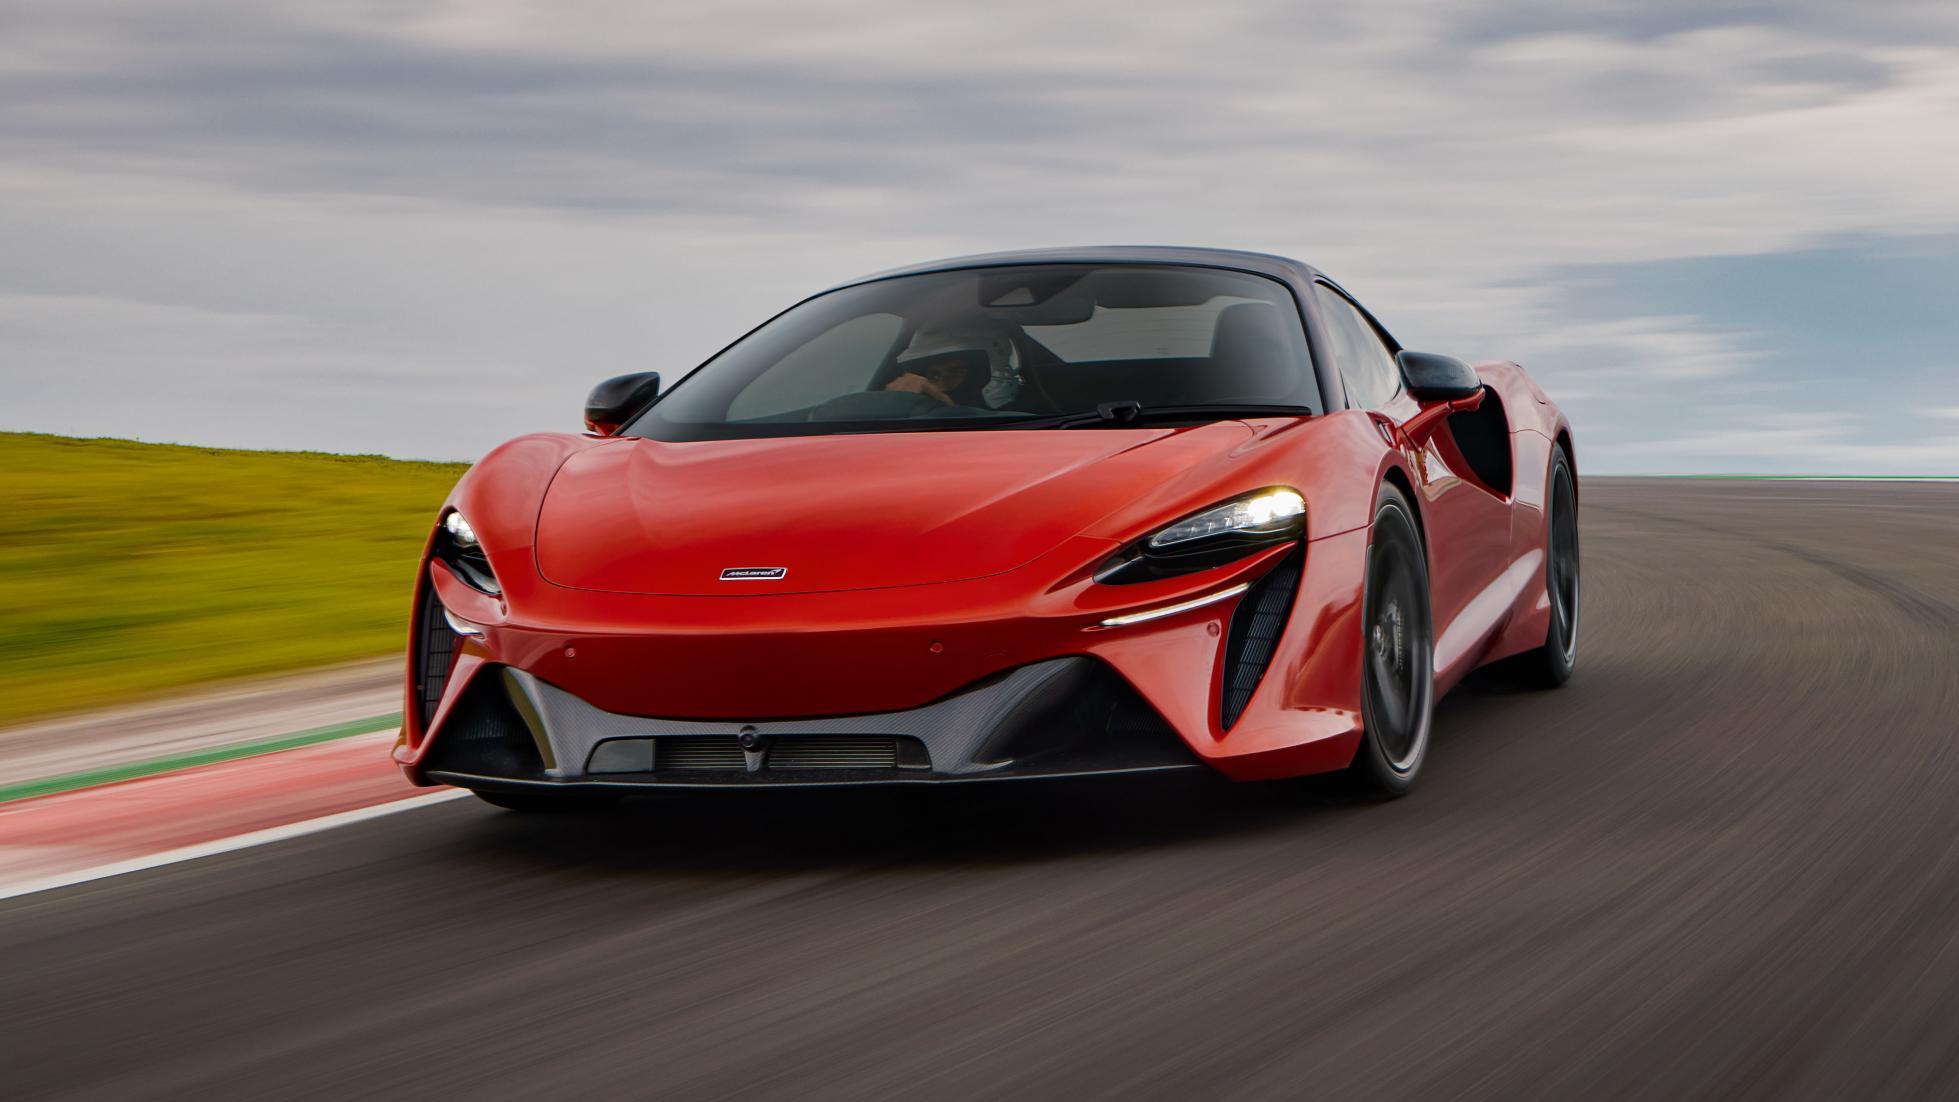 McLaren Artura angled front view